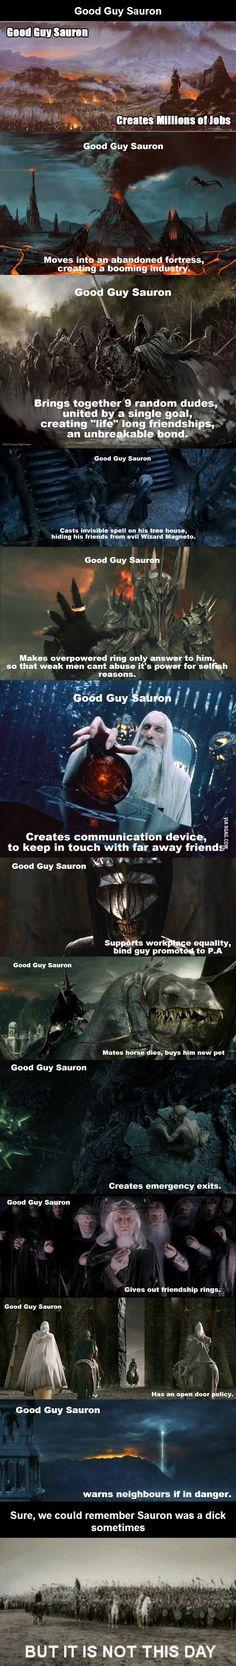 Good guy sauron